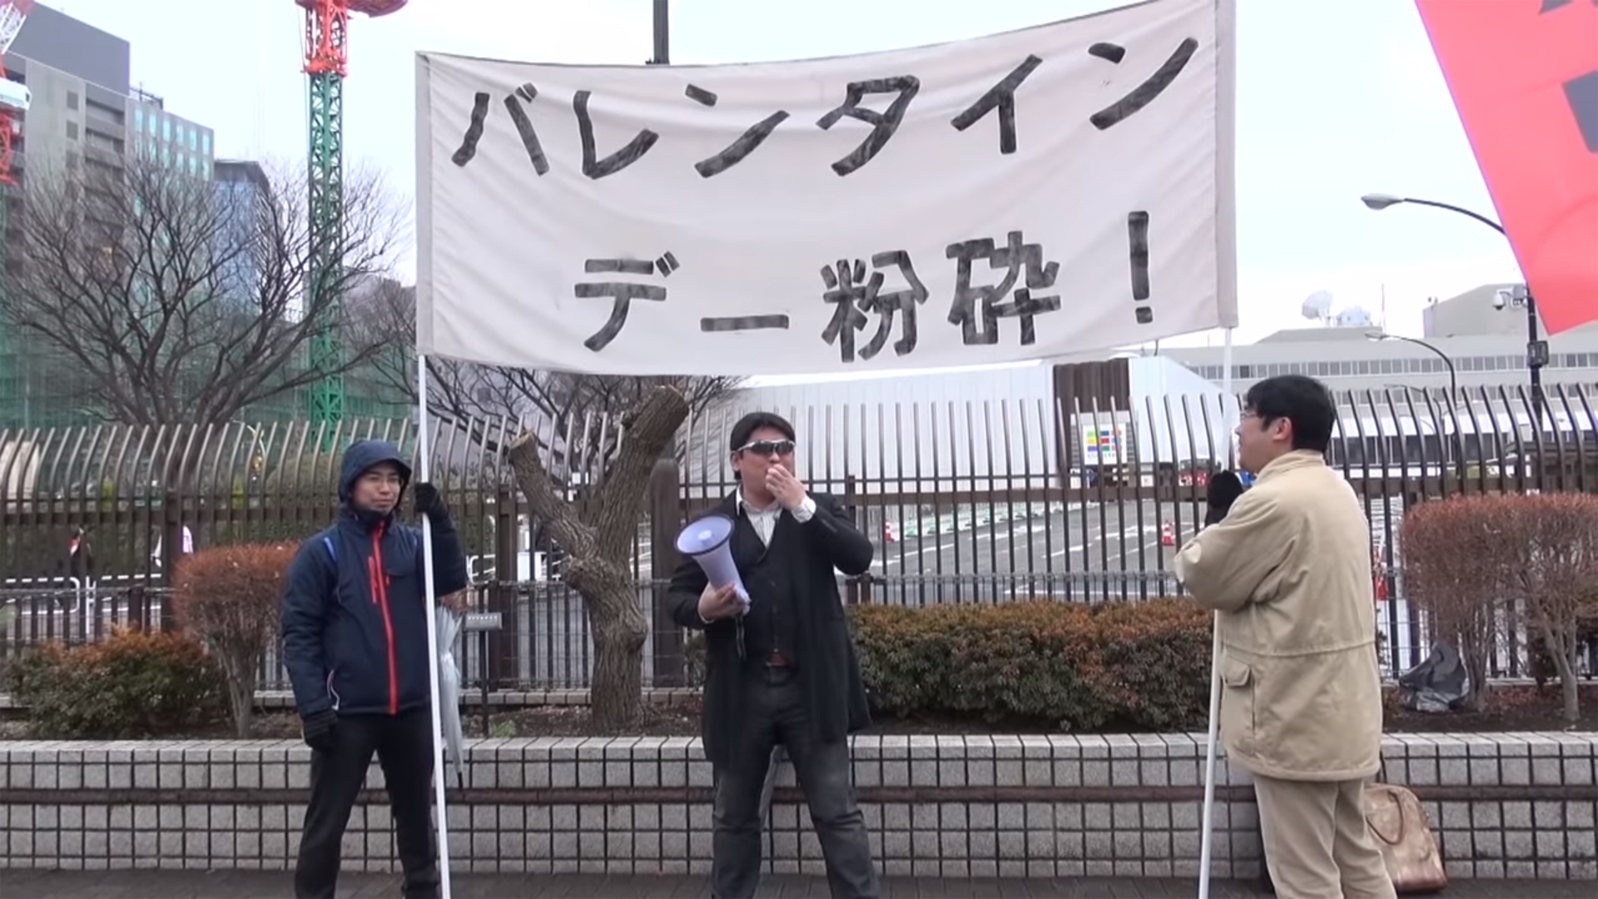 Japanese 'Alliance Of Unpopular Men' Hold Protest Against Valentine's Day